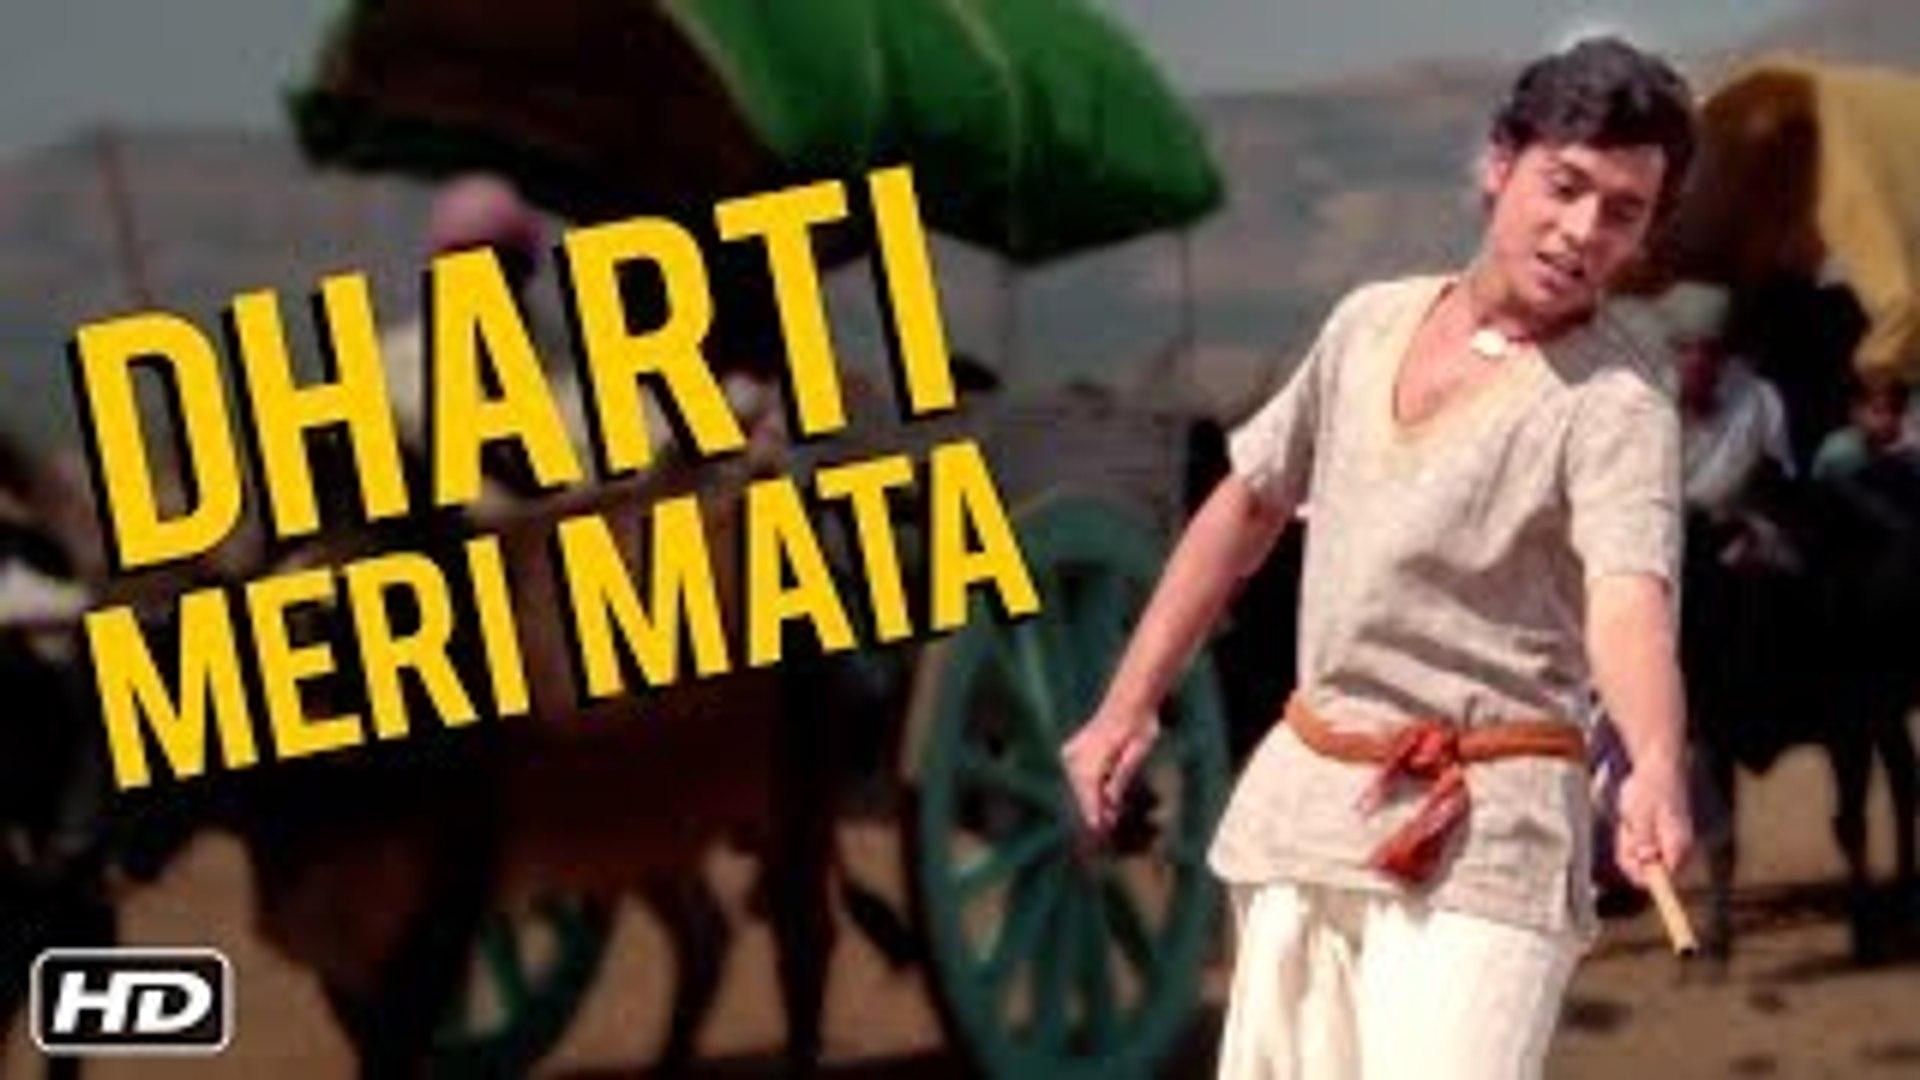 Dharti Meri Mata Full Video Song   गीत गाता चल   Sachin   Sarika   Ravindra  Jain   Geet Gaata Chal